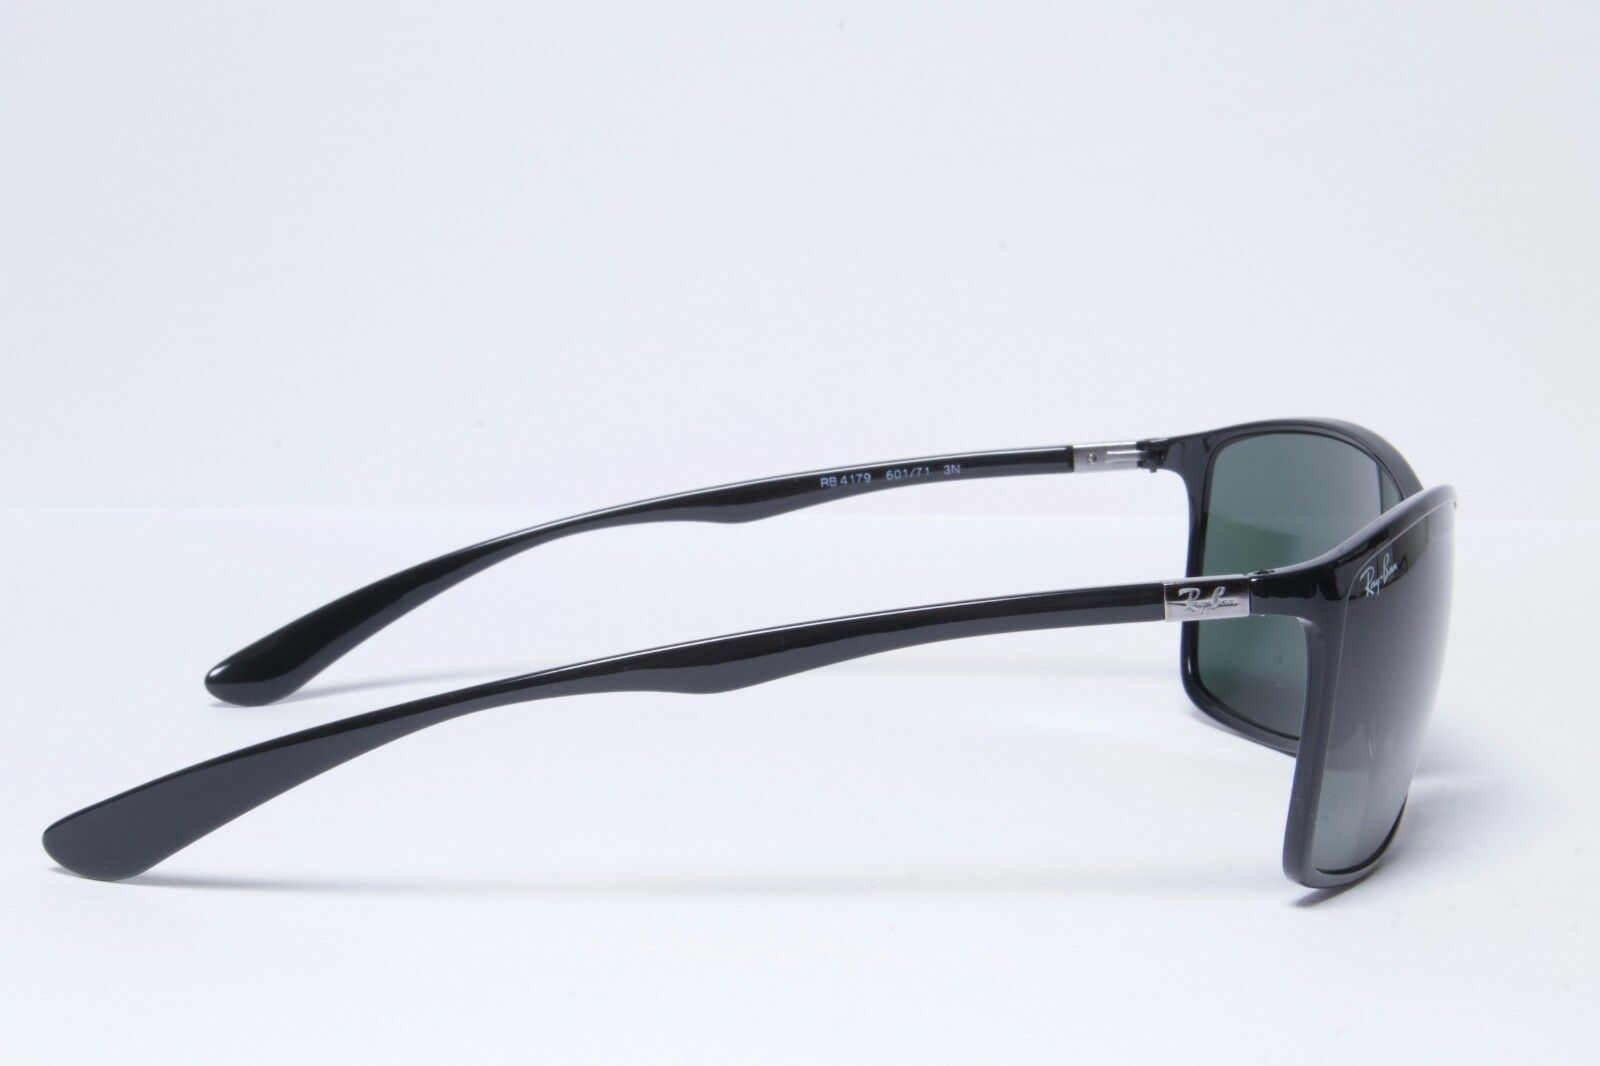 231fa9c2ec Ray-Ban Rb4179 601 71 Liteforce Sunglasses Black Frame Green Lenses 62mm  for sale online